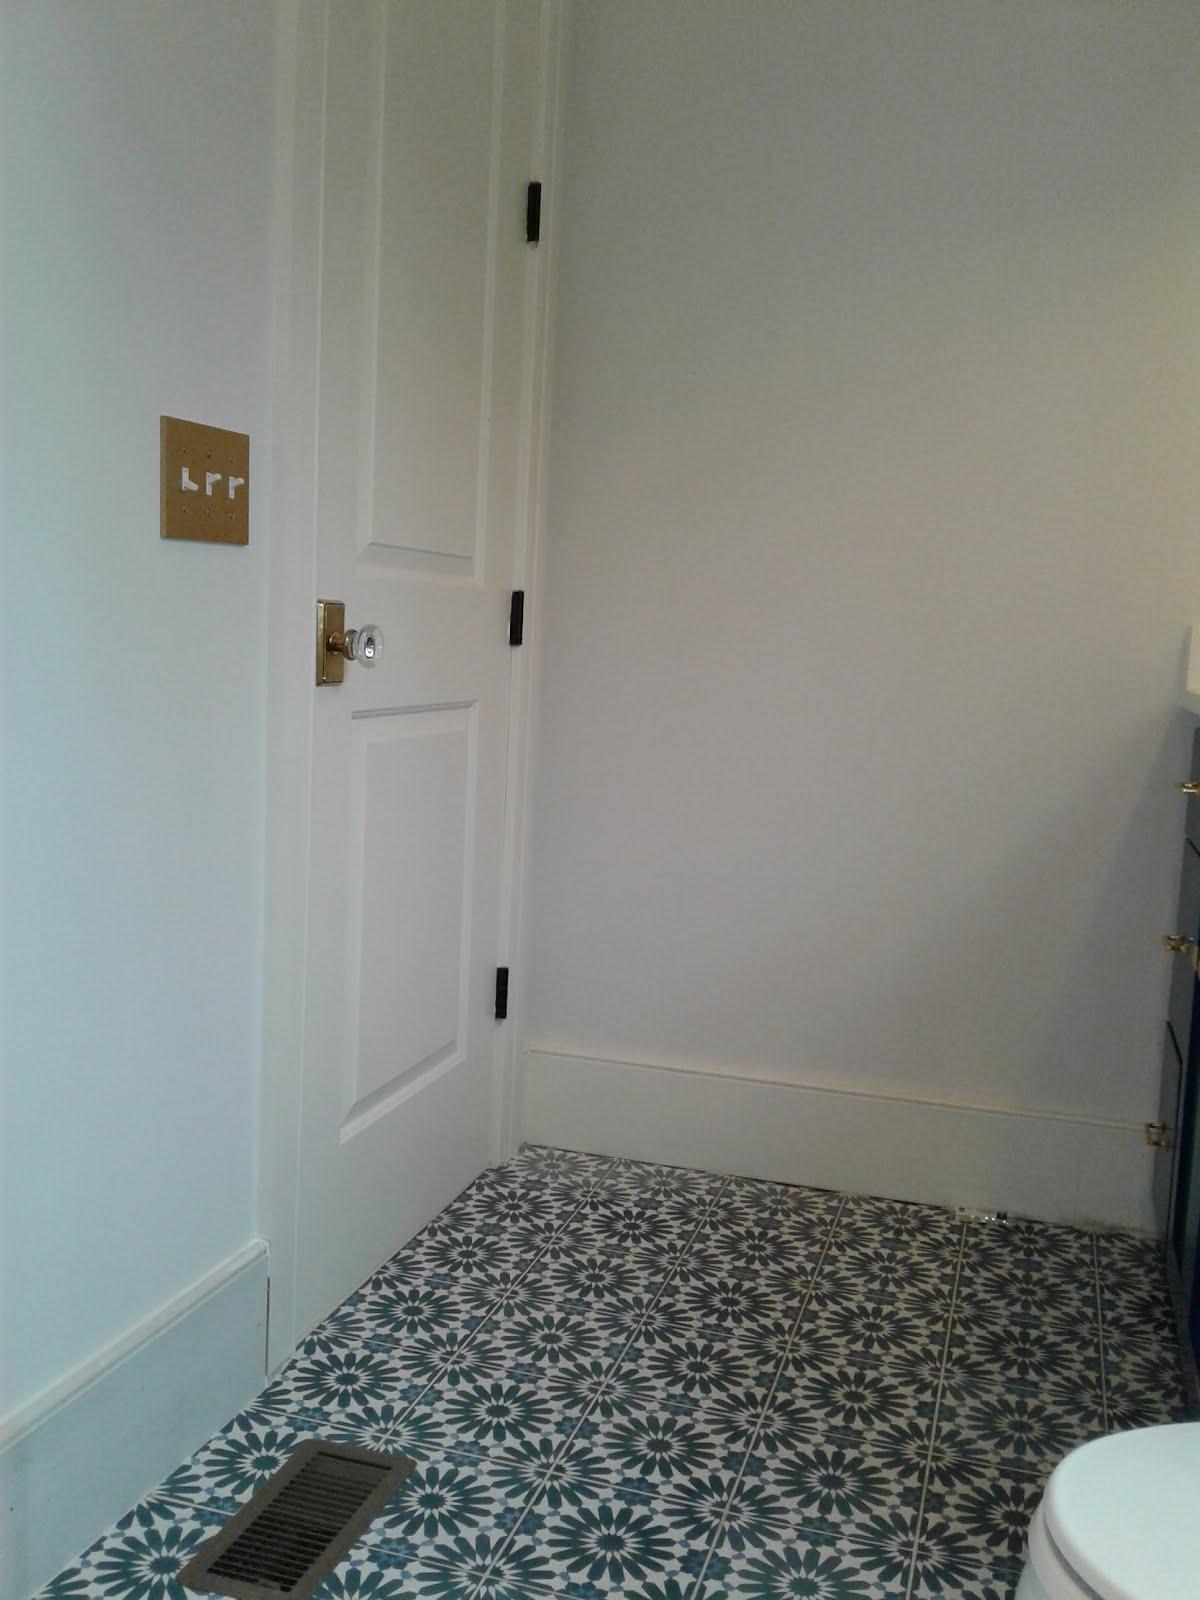 Our tile work passuluna concrete ceramic tile instal dailygadgetfo Choice Image